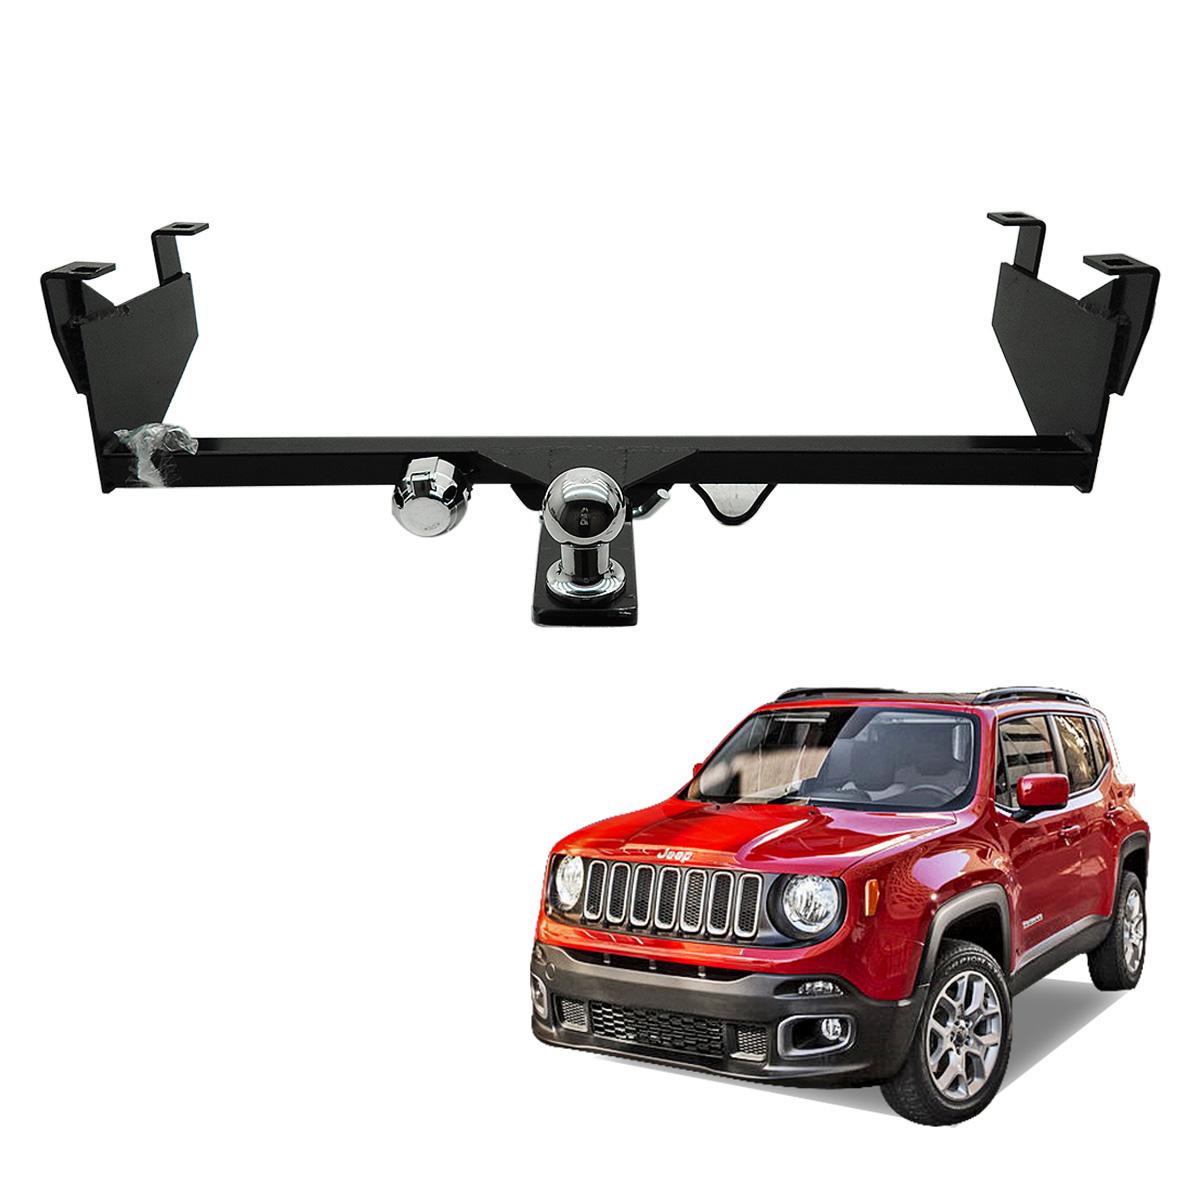 Engate de reboque Jeep Renegade 2016 2017 tra��o 4x2 remov�vel 1000 Kg